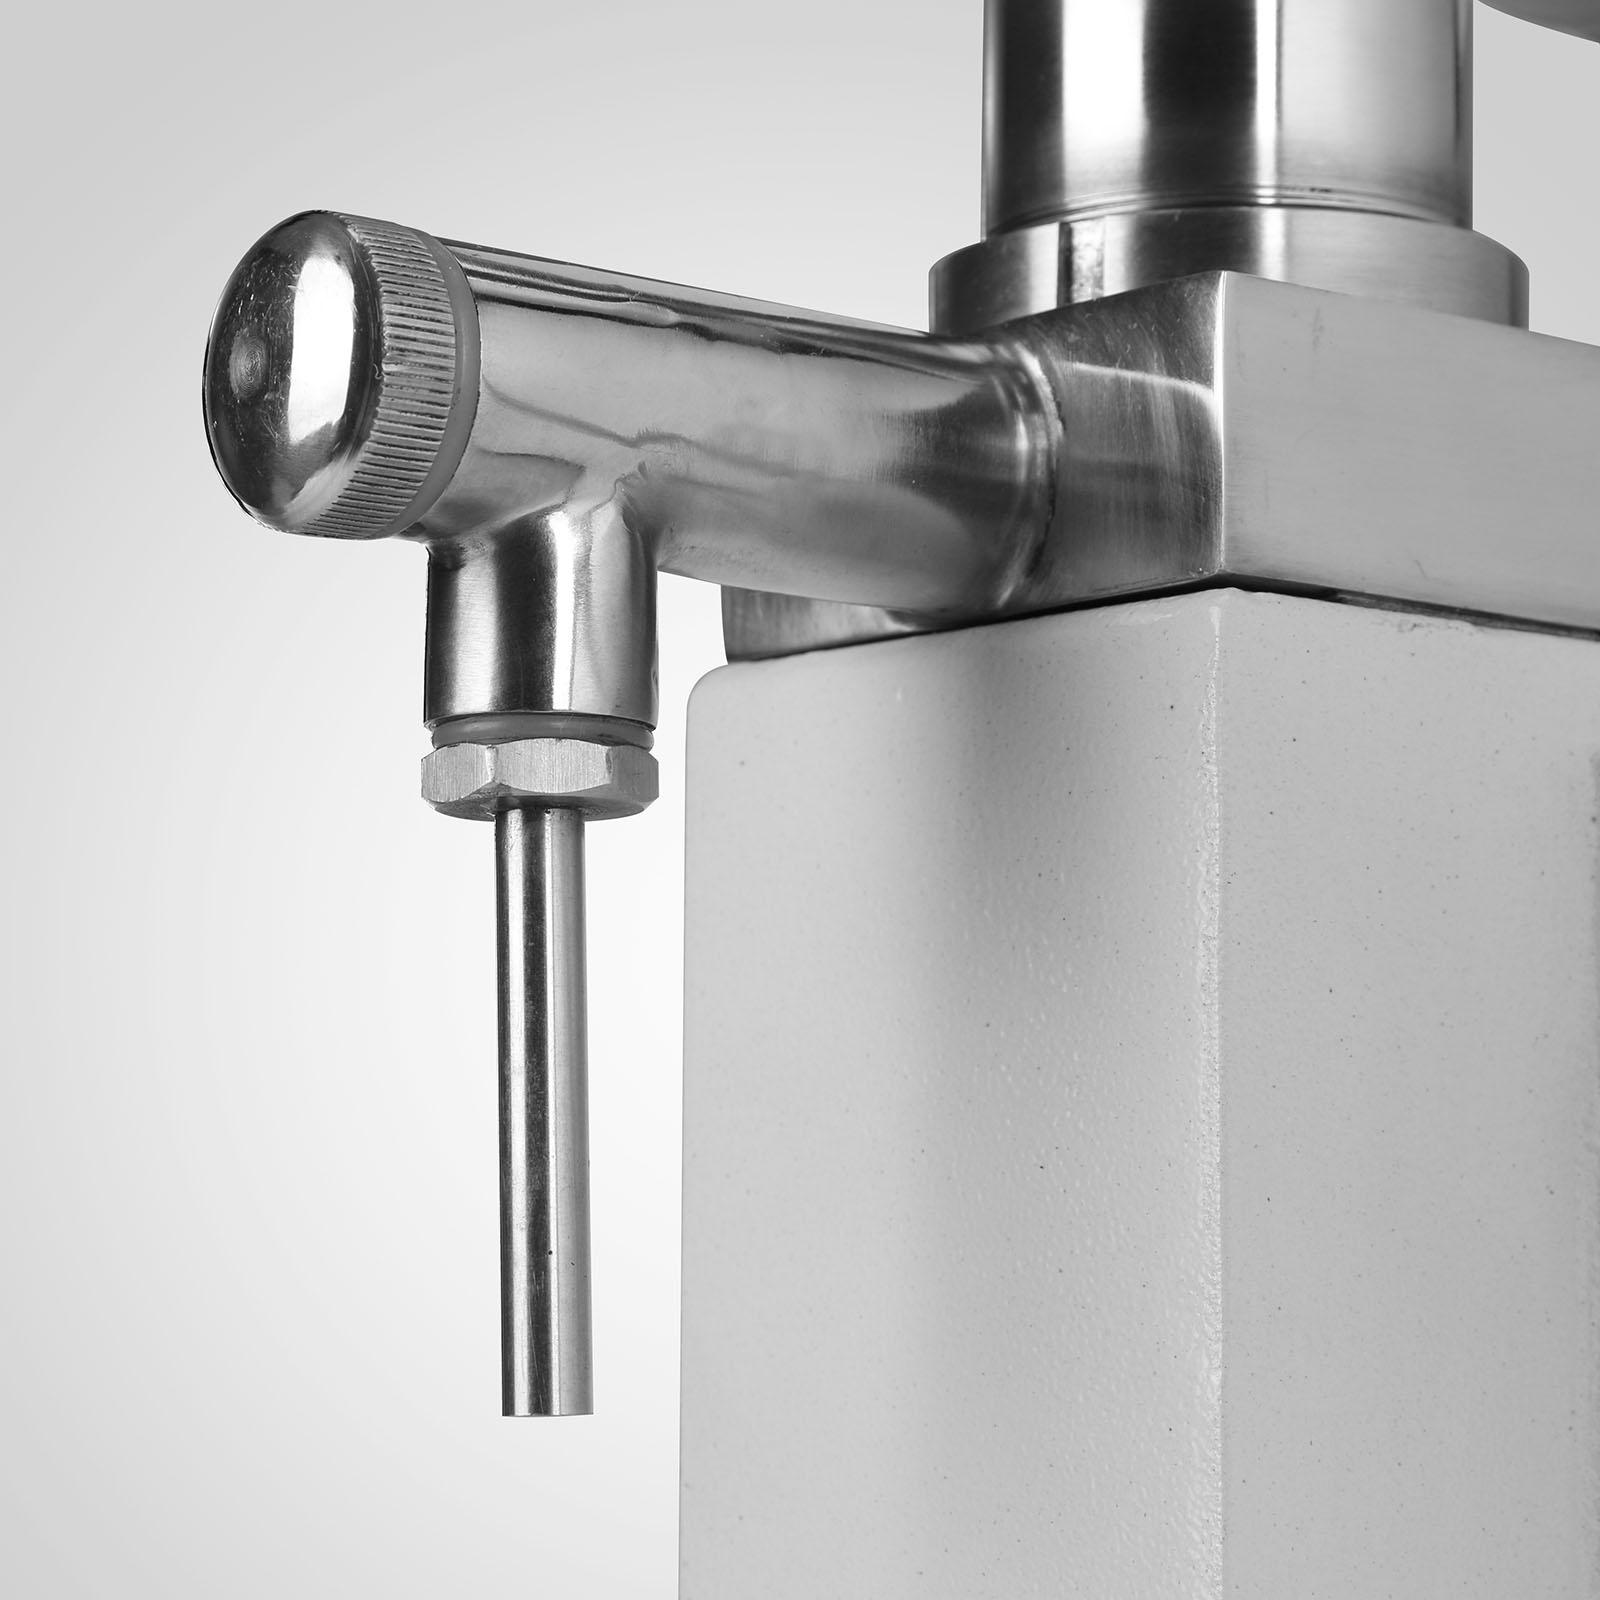 Liquid-Filling-Machine-Filler-Remplissage-2-3500ML-50-500ML-INDUSTRY-SUPPLY miniature 22